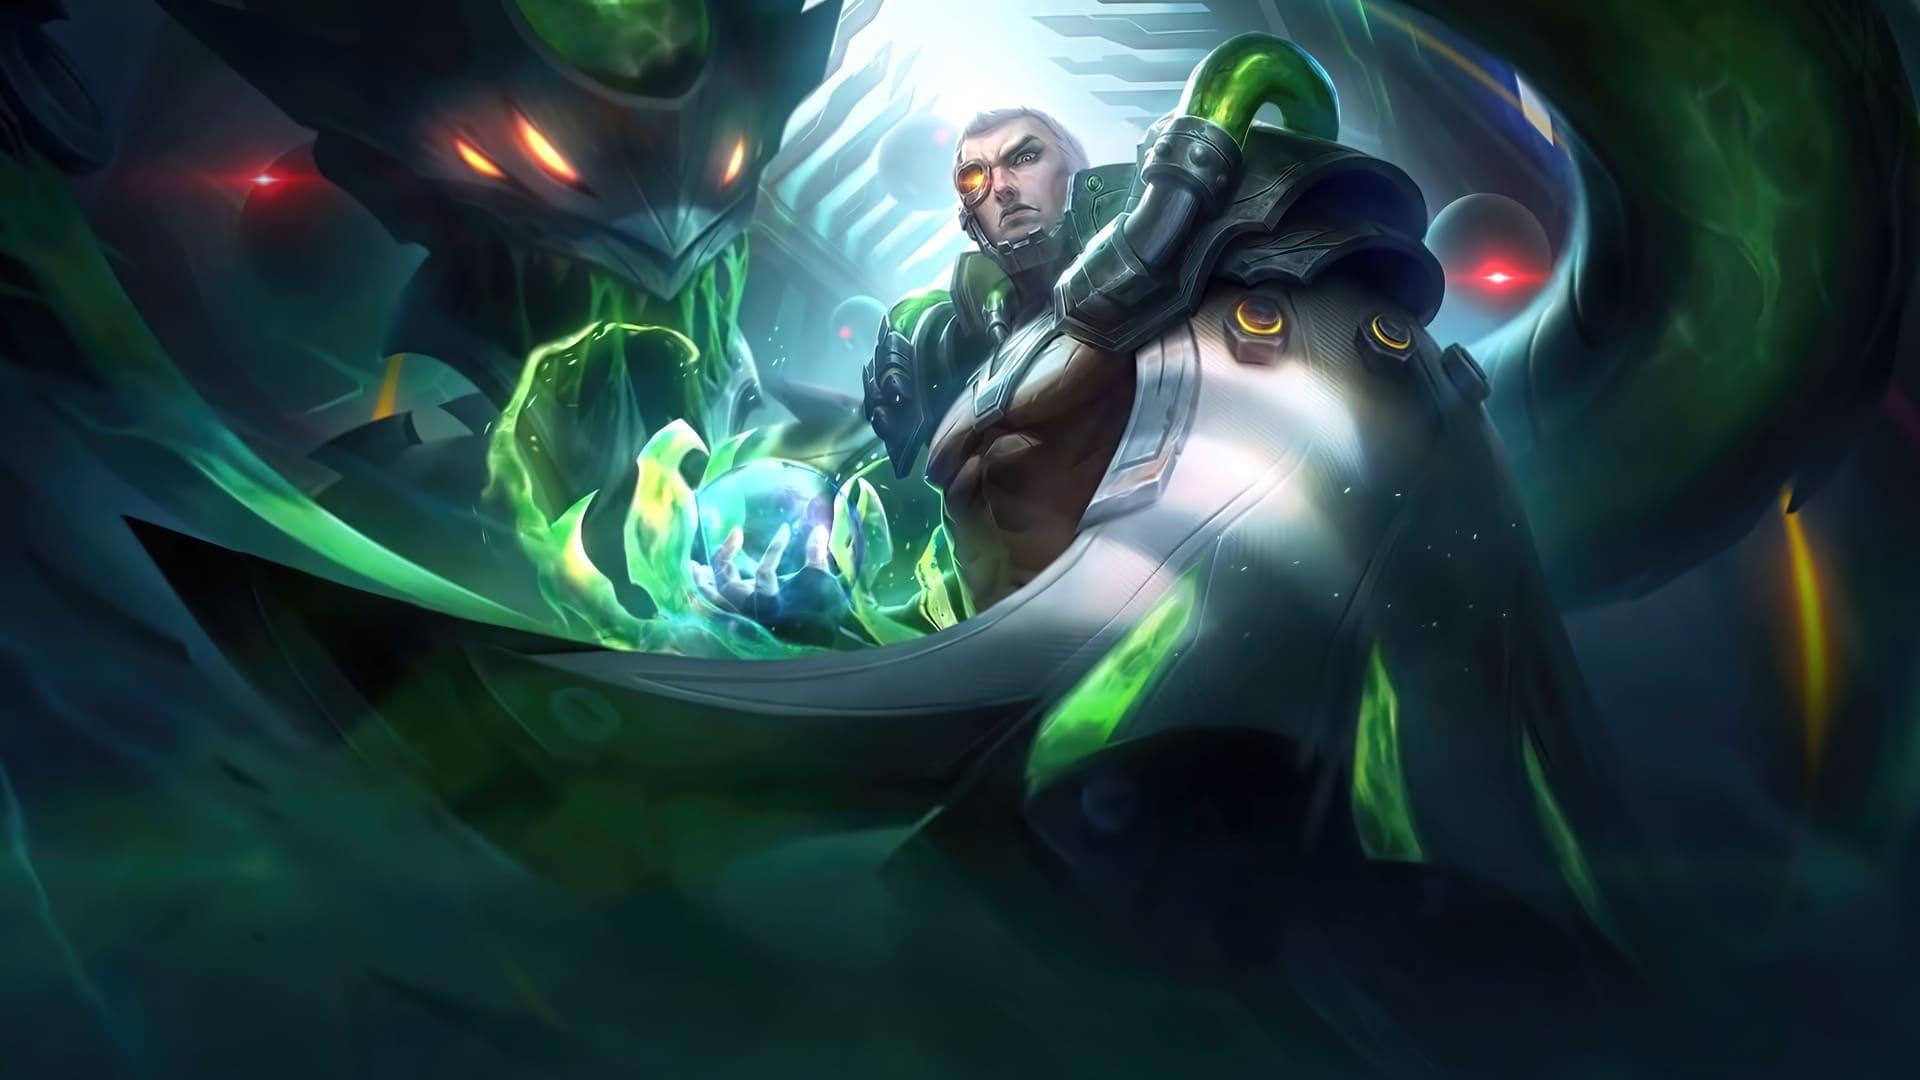 yu zhong biohazard mobile legends skin for PC hobigame